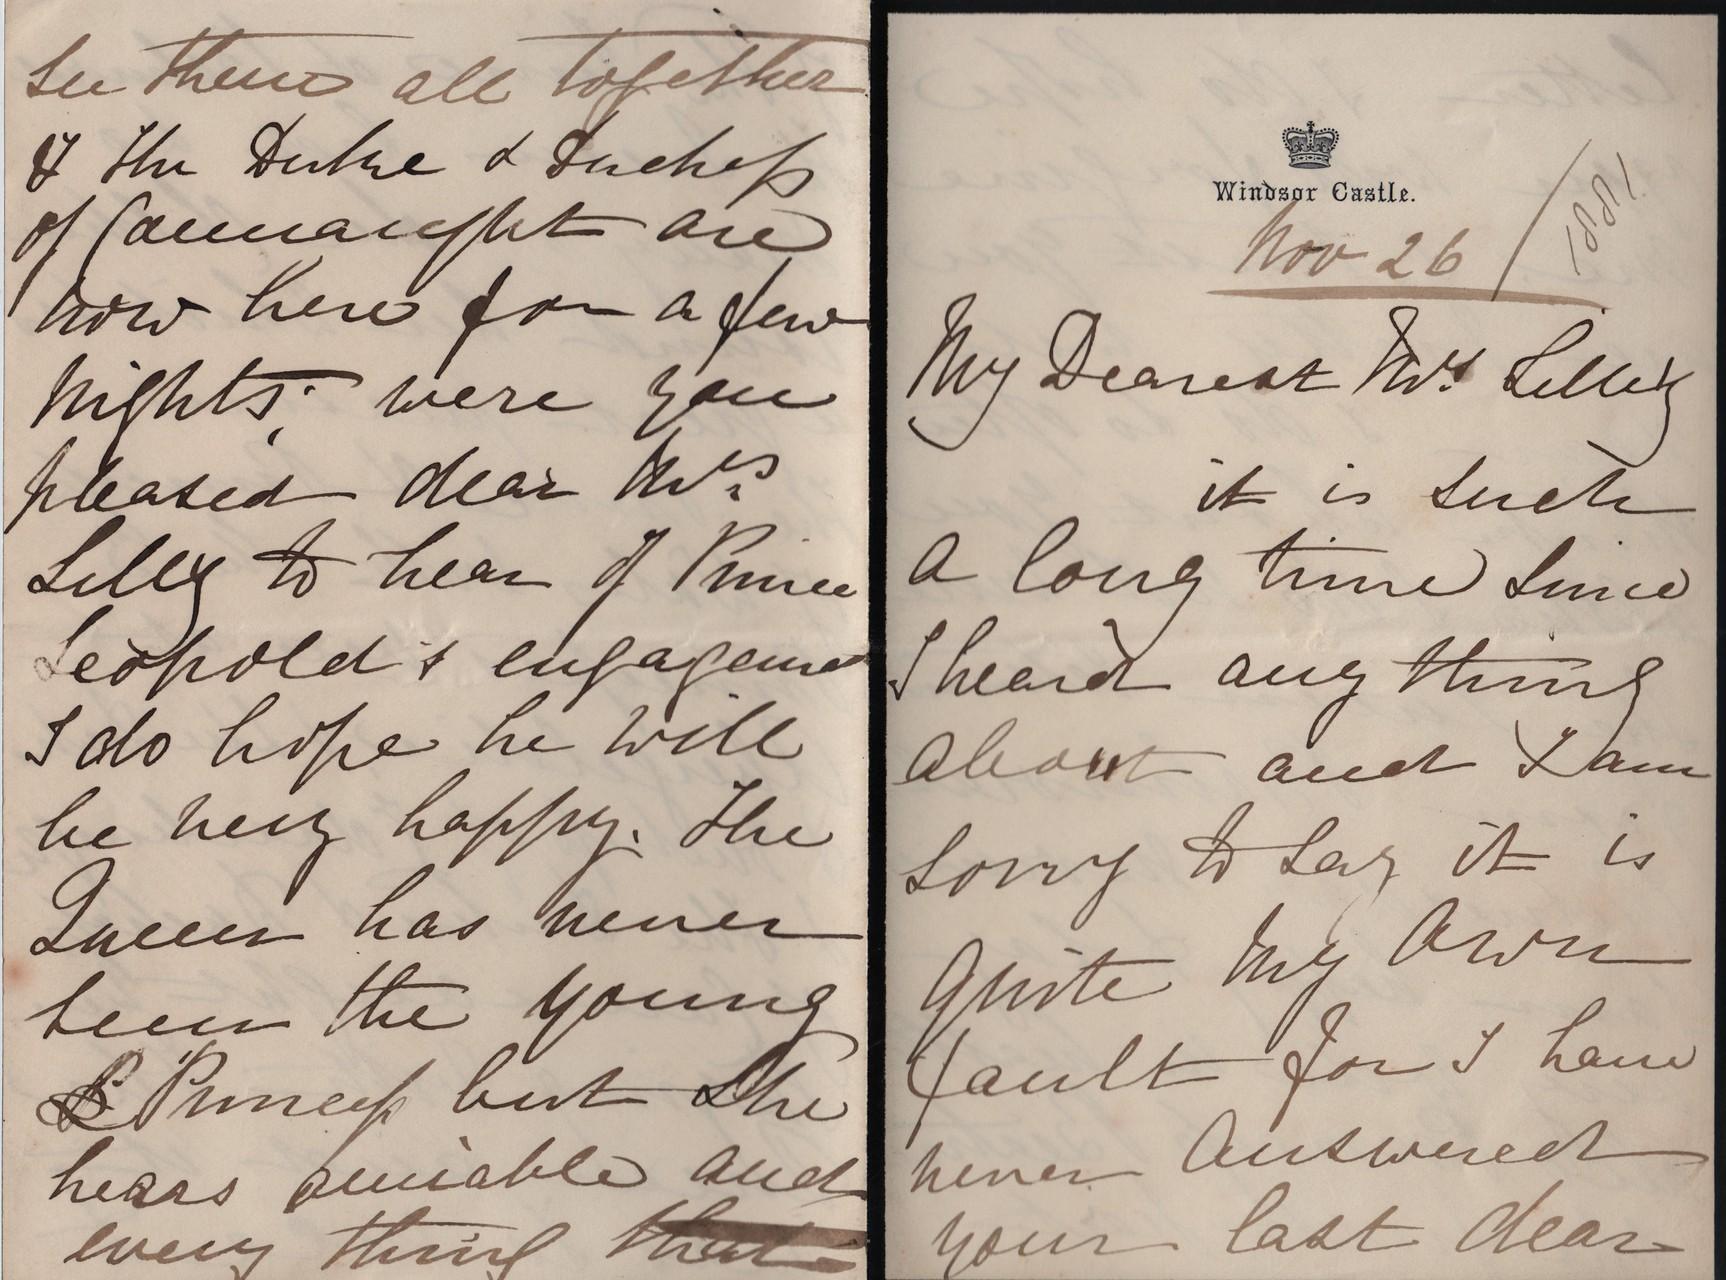 1881 November 26th